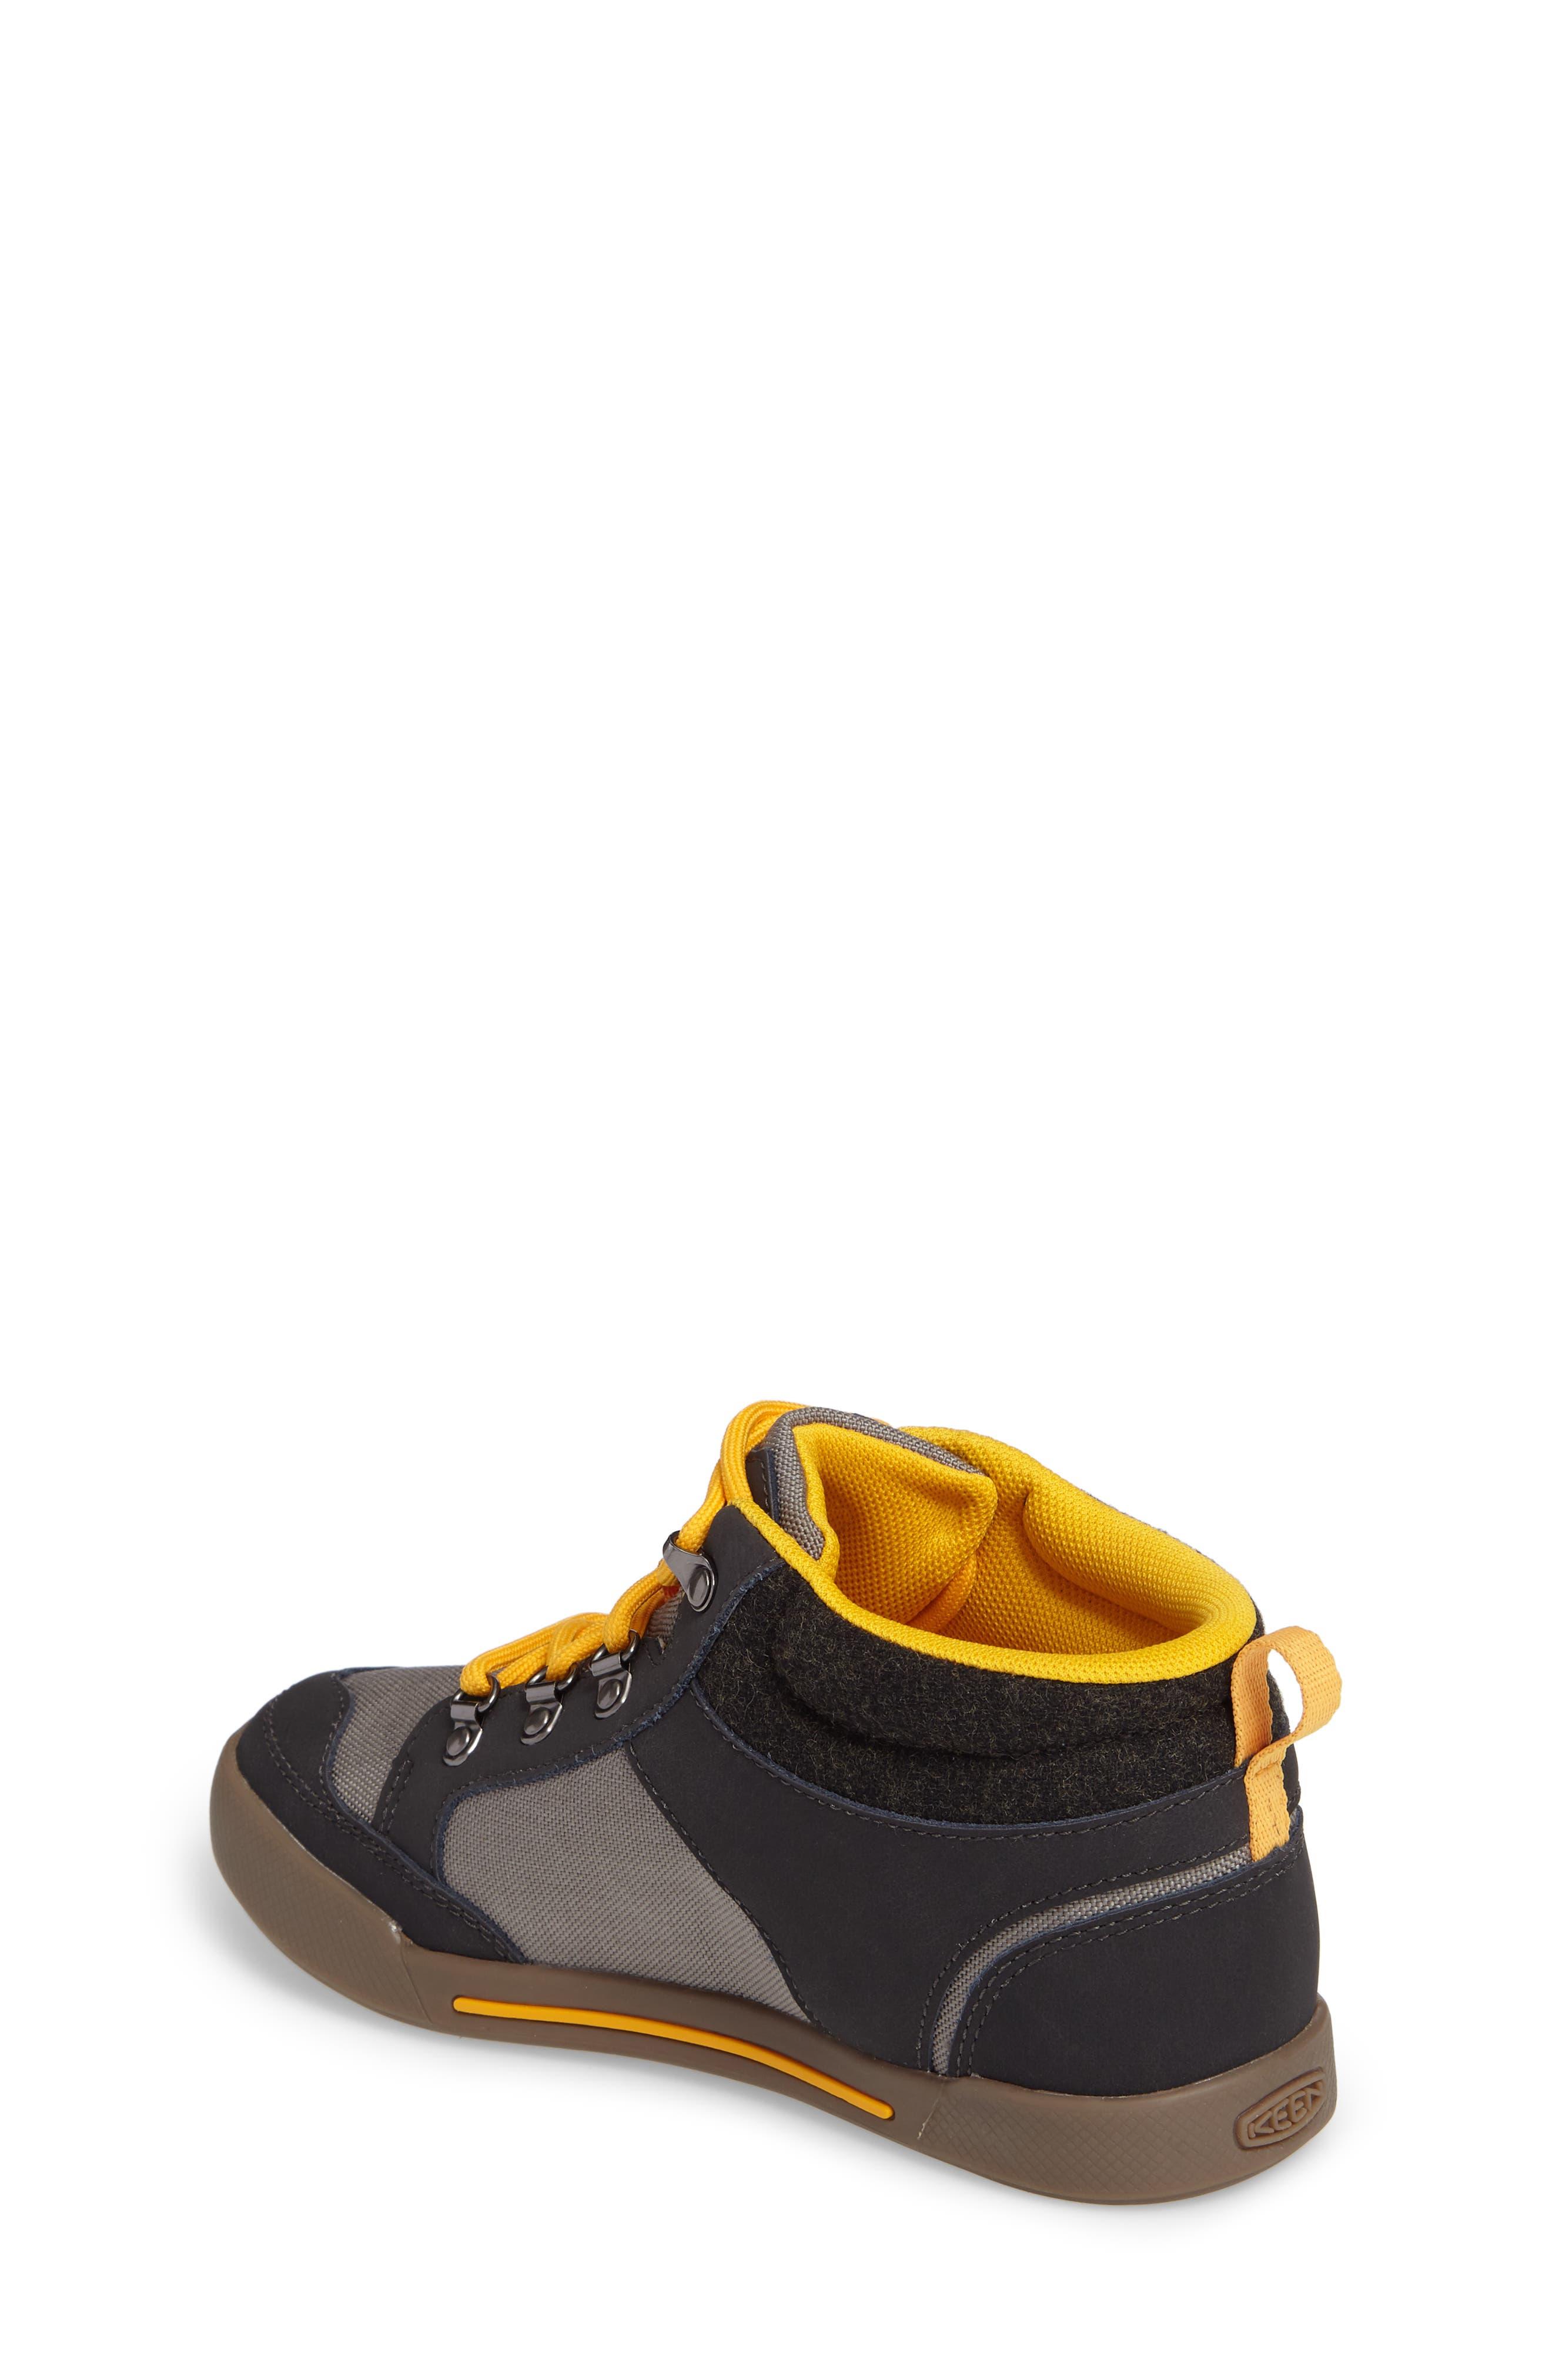 Encanto Wesley II High Top Sneaker,                             Alternate thumbnail 4, color,